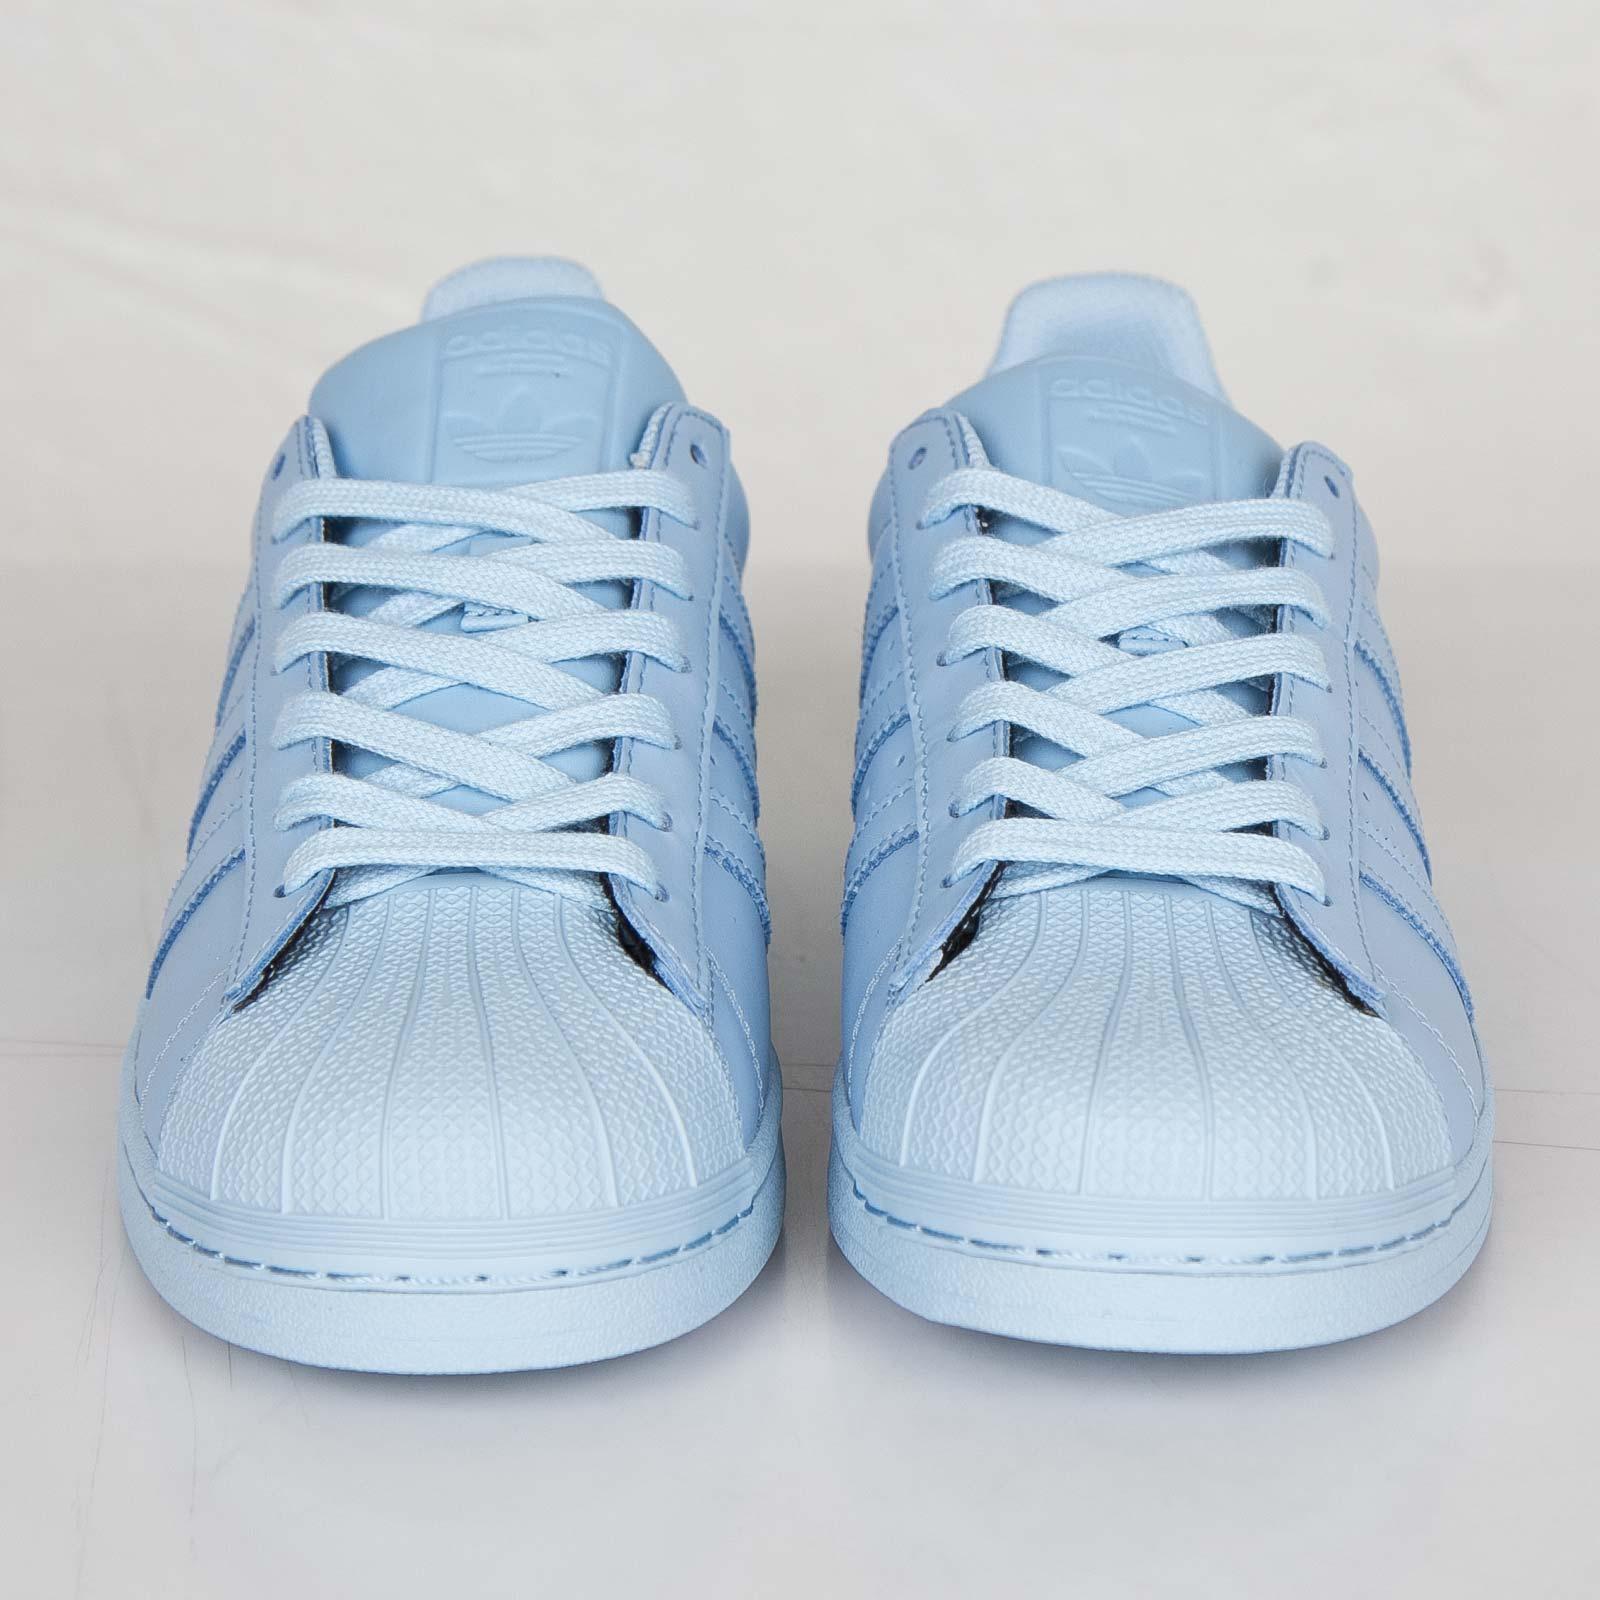 adidas Superstar Supercolor Pack S41830 Sneakersnstuff